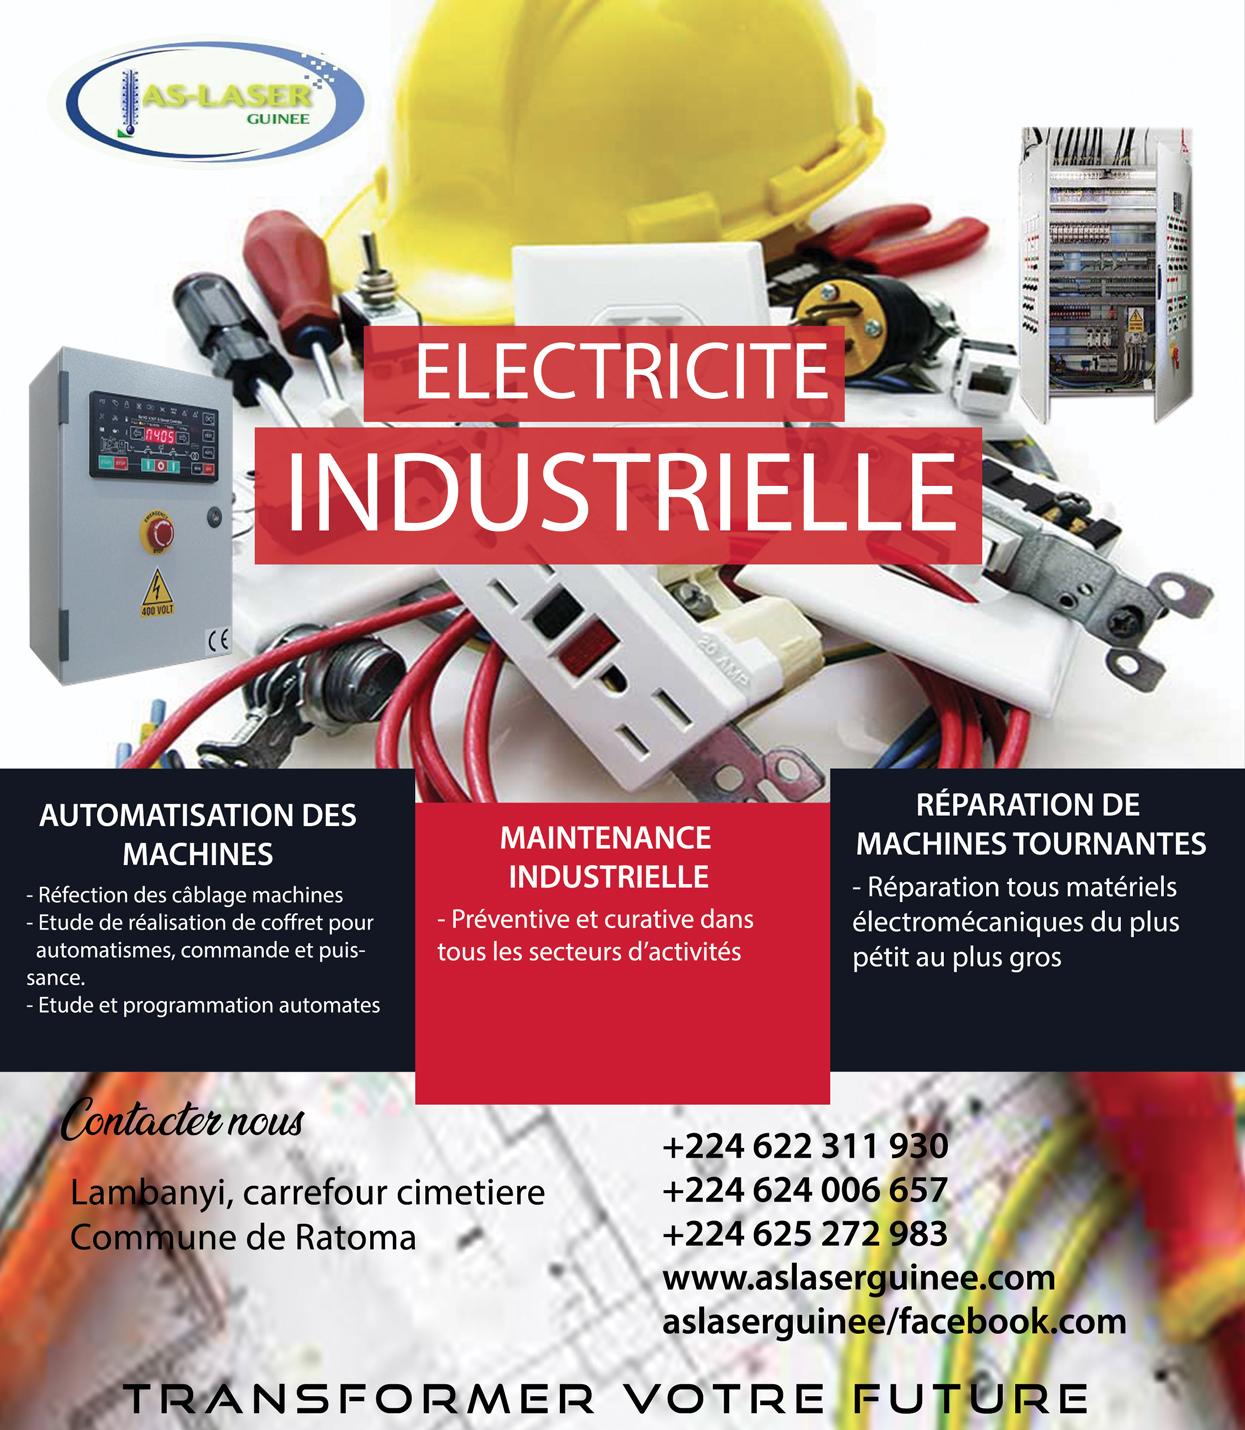 Affiche-electricite-industrielle.jpg